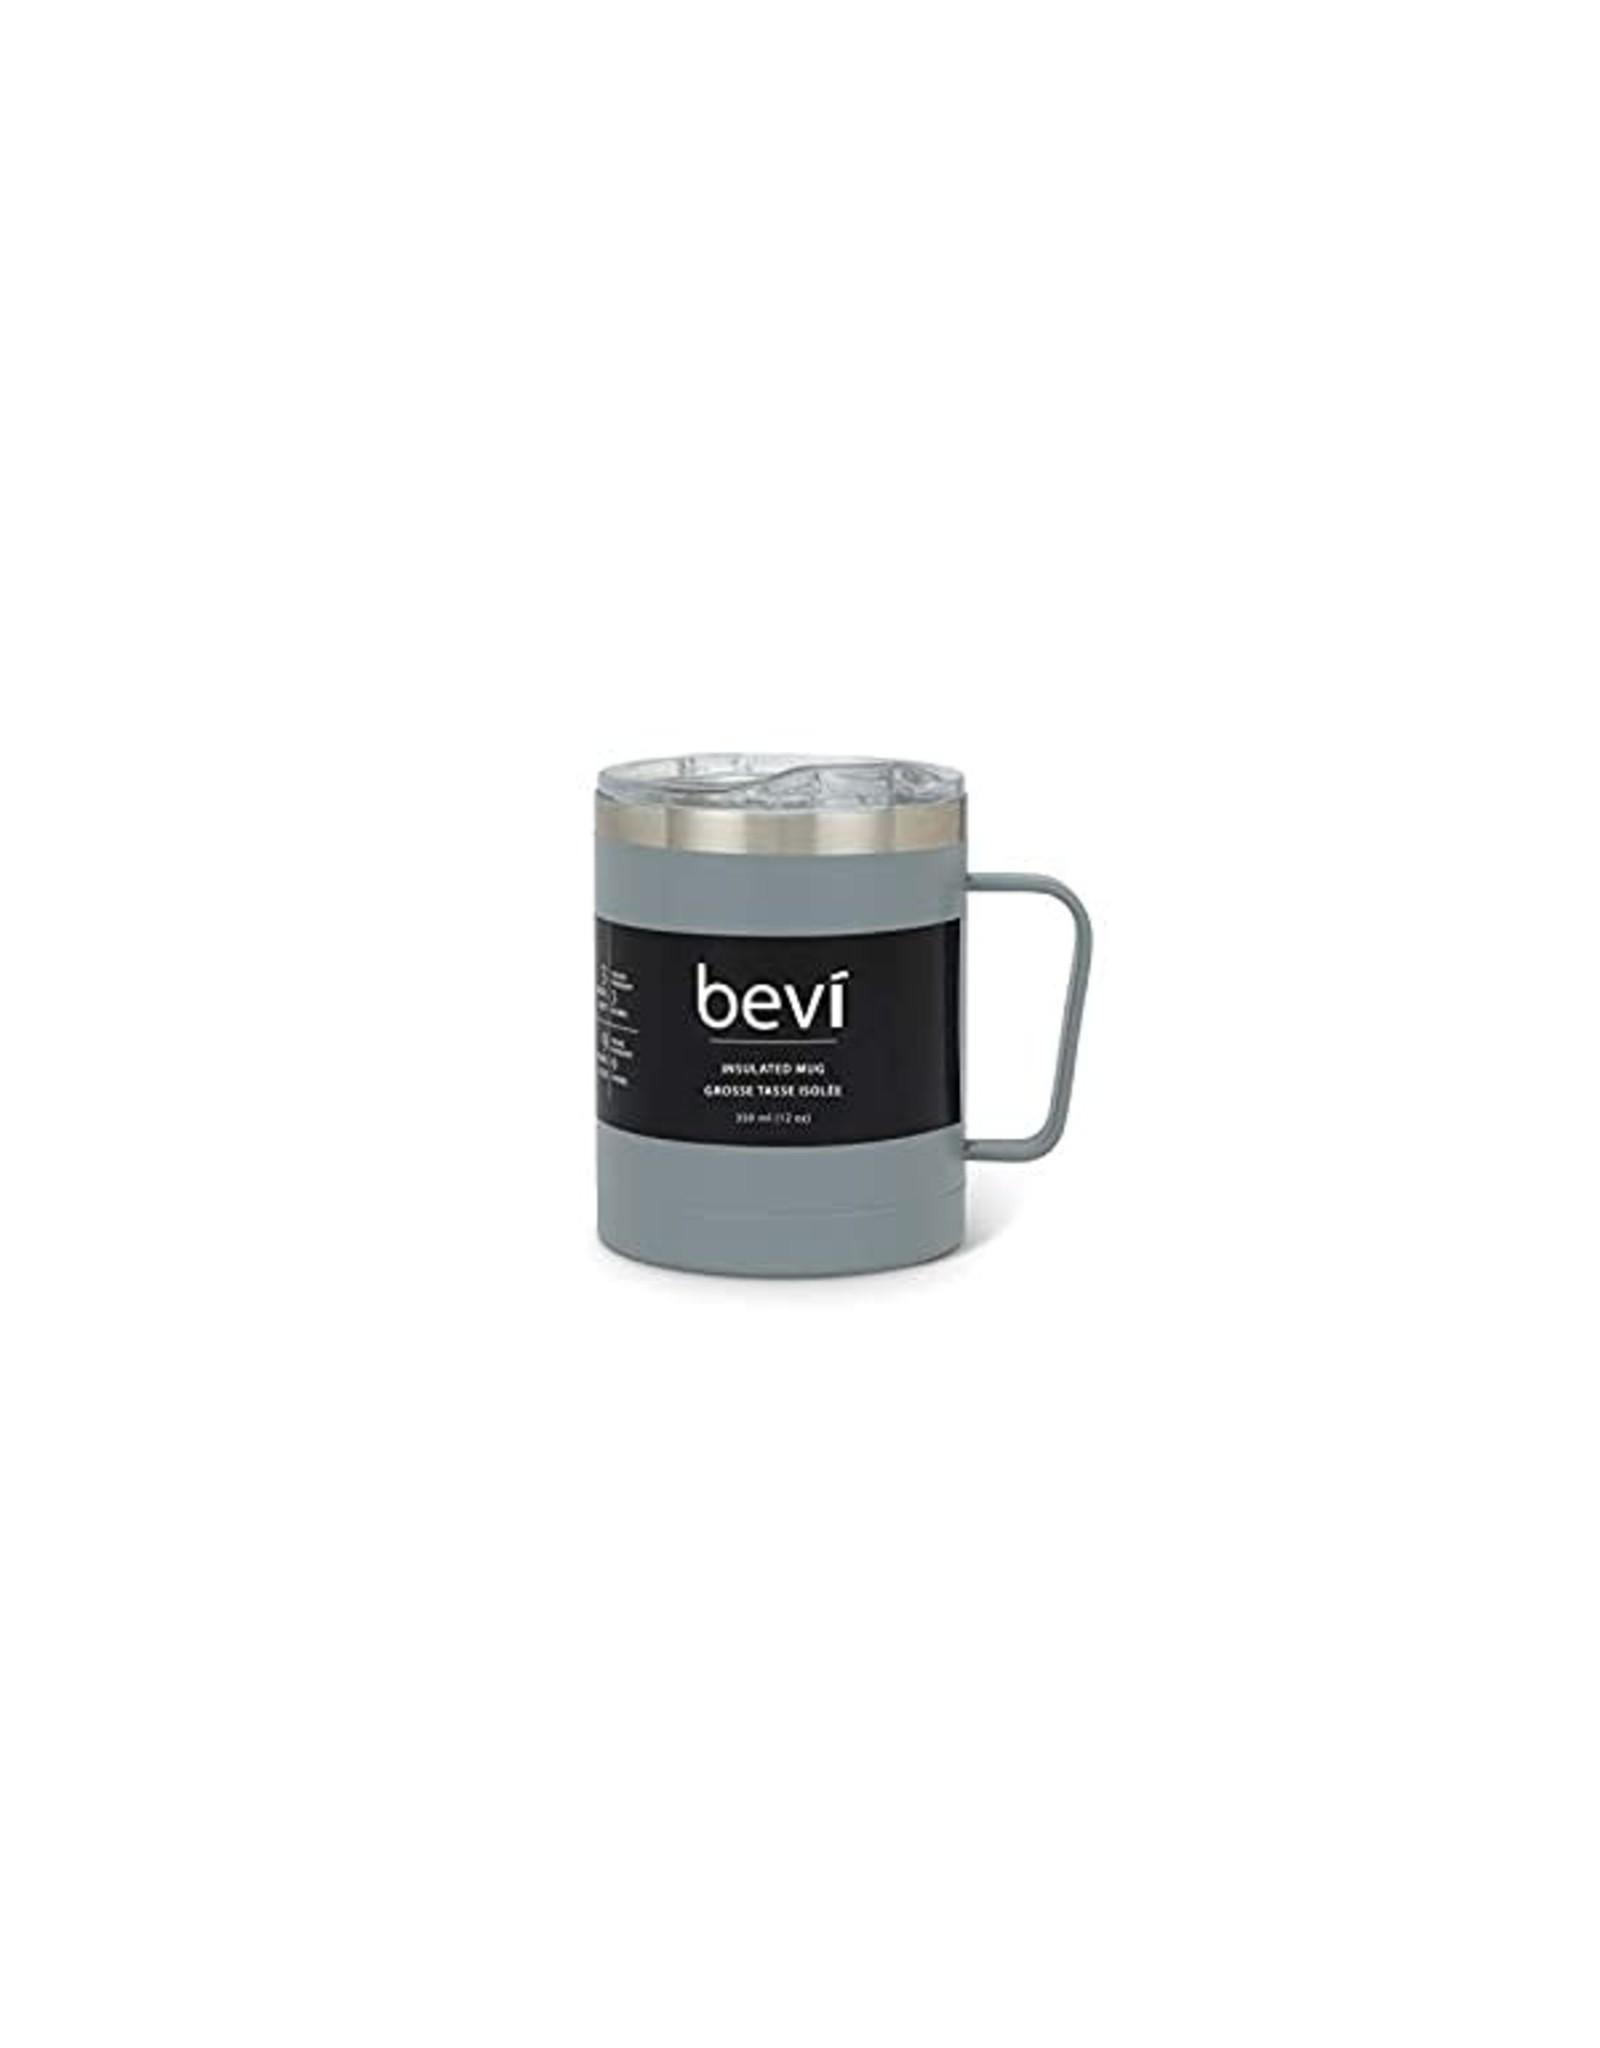 Bevi Insulated Mug 12oz